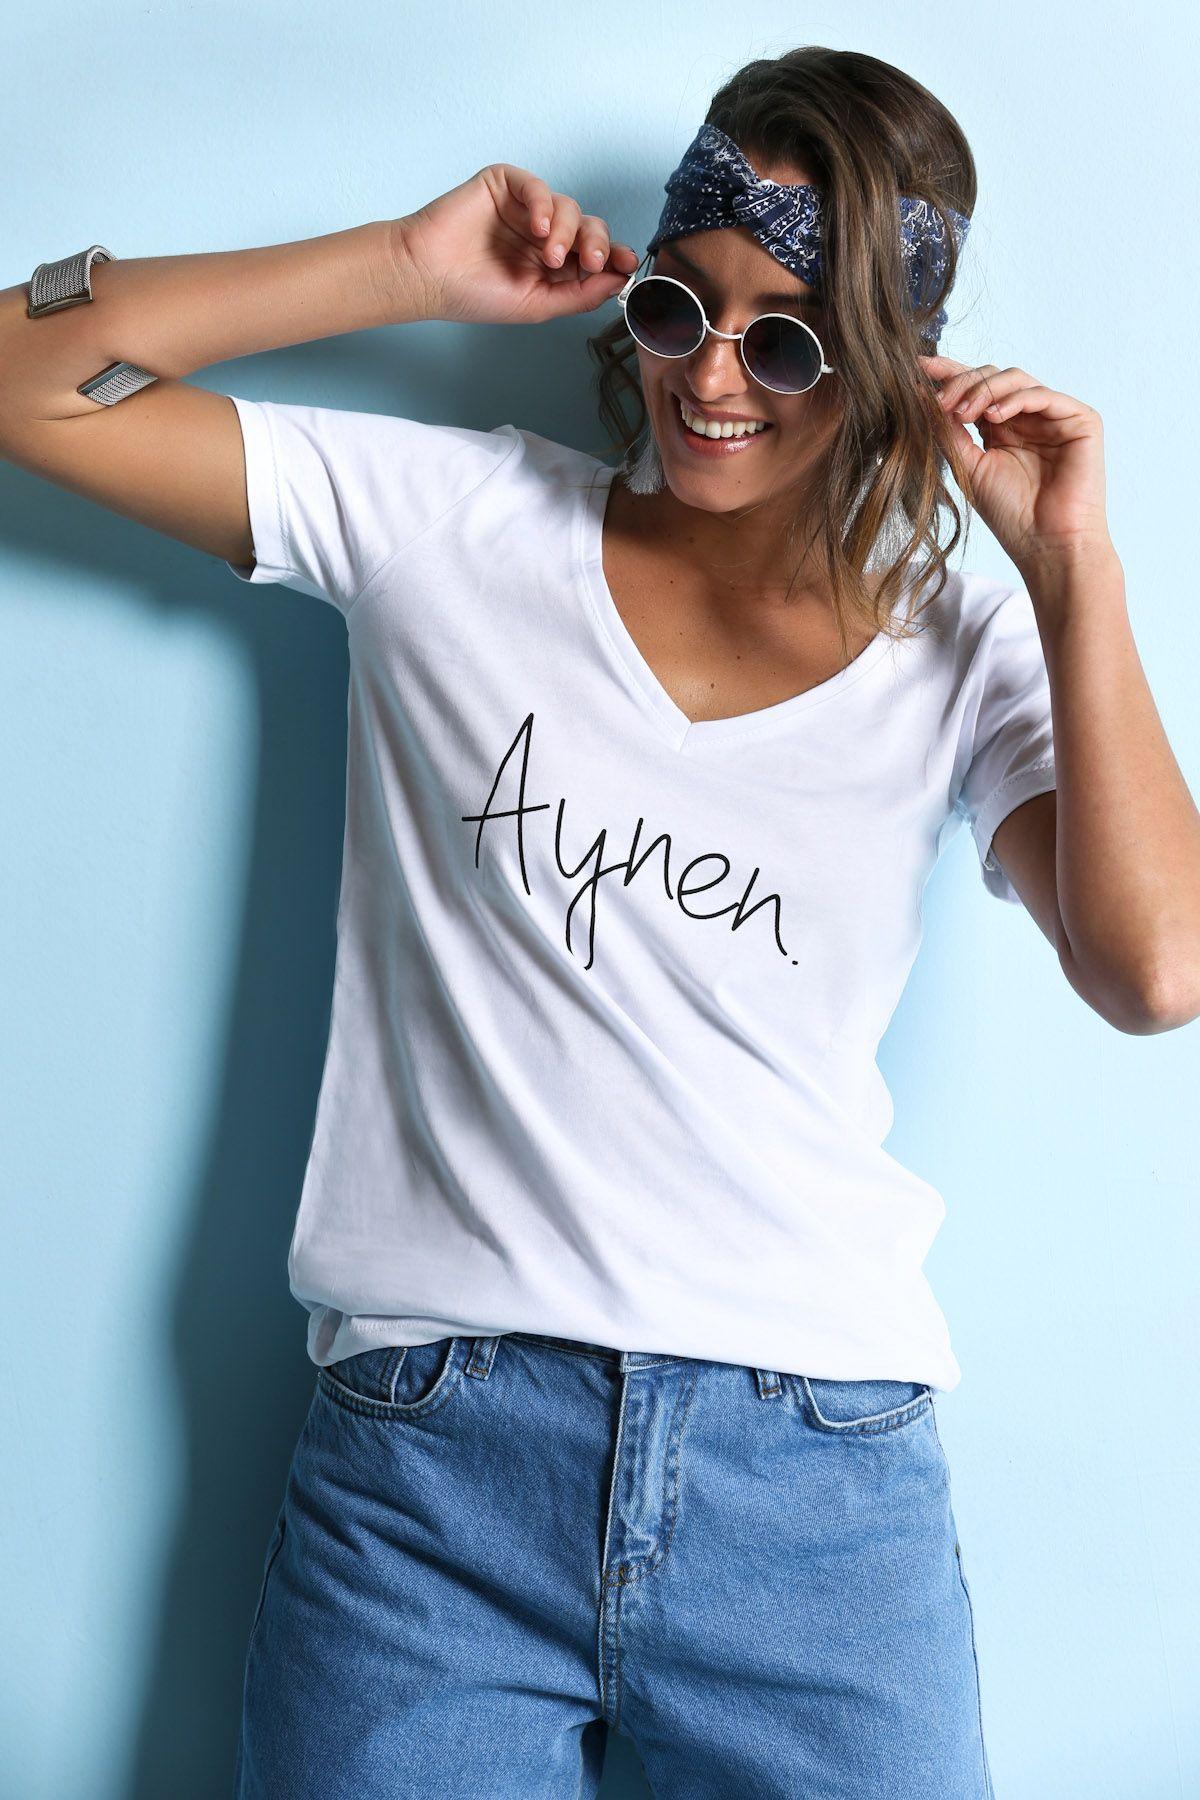 Yazili V Yaka Tshirt 19 99 Tl Bildigimiz Gibi Son Donemlerde Yazili Tisortler Cok Populer Ama Siz Ingilizce Degilde Turkce Yazili Bir T Moda Kadin Giyim Giyim